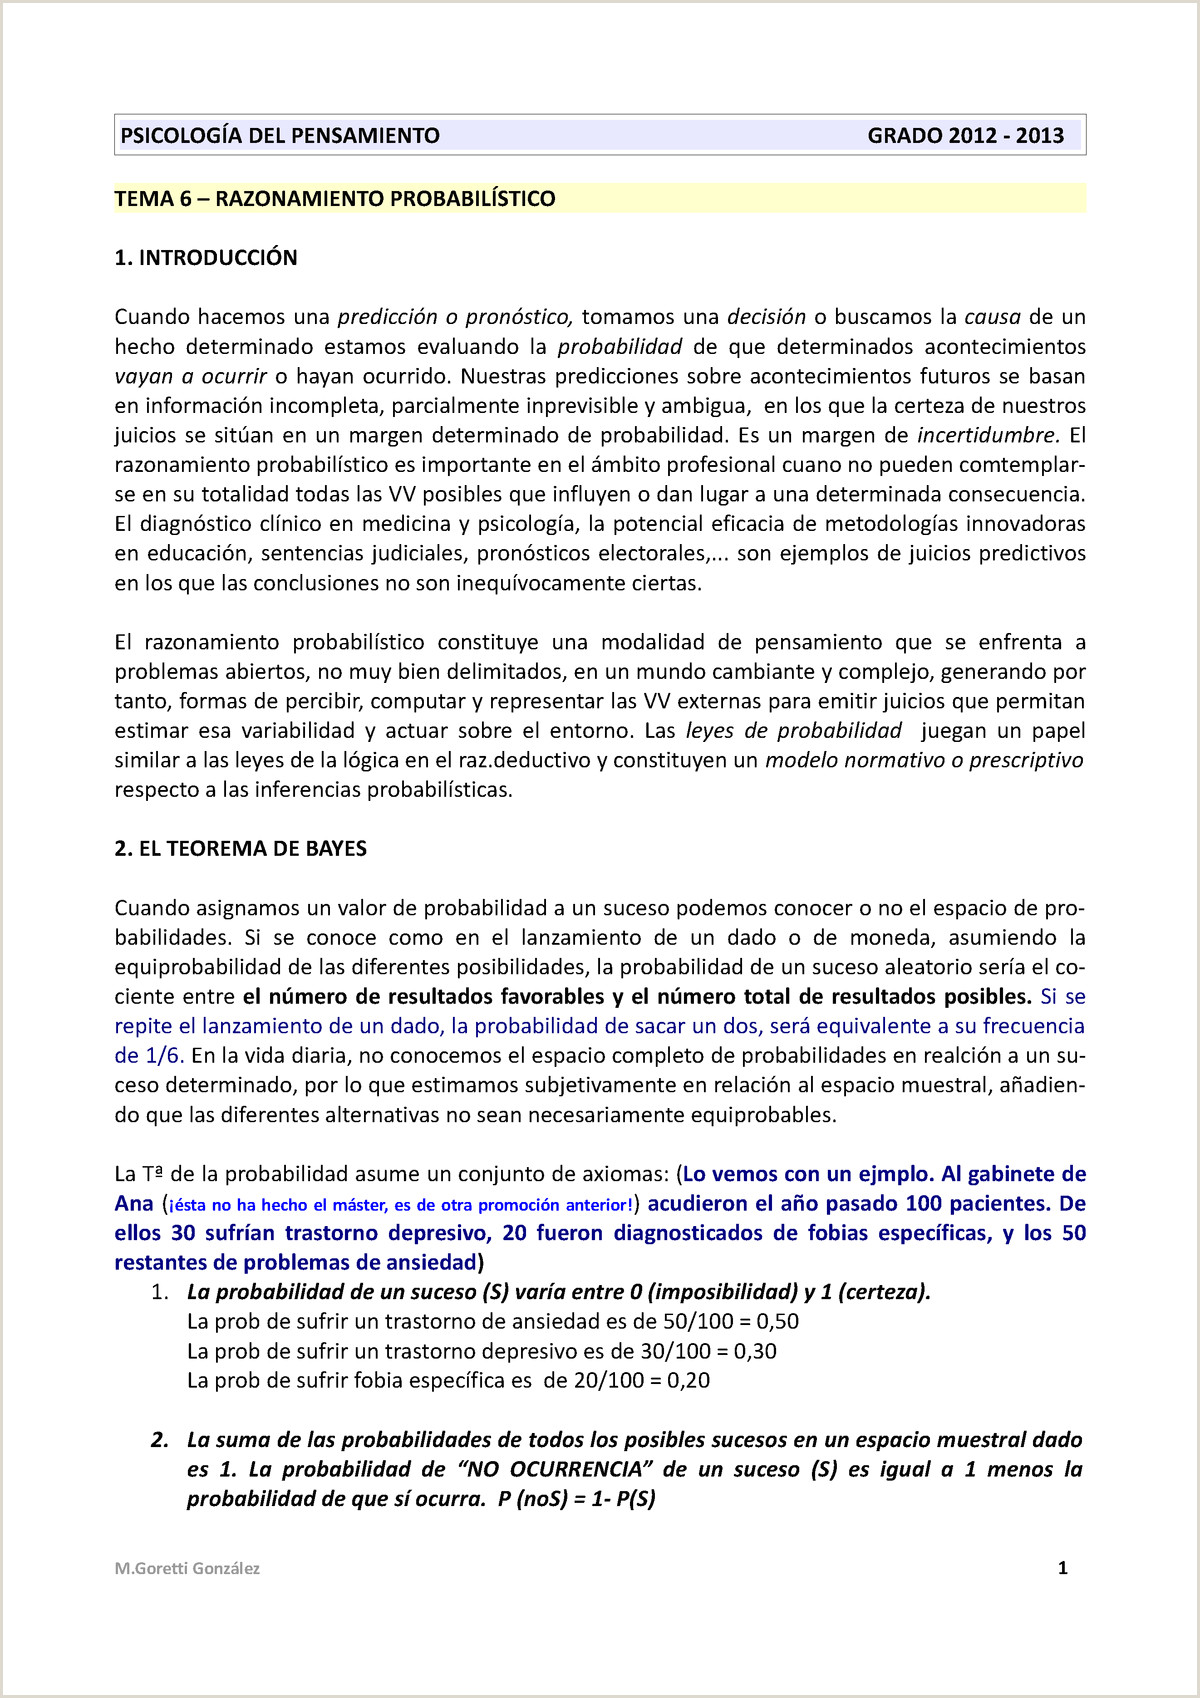 Formato De Hoja De Vida Llamativo 6 T6 Goretti Razonamiento Probabilstico